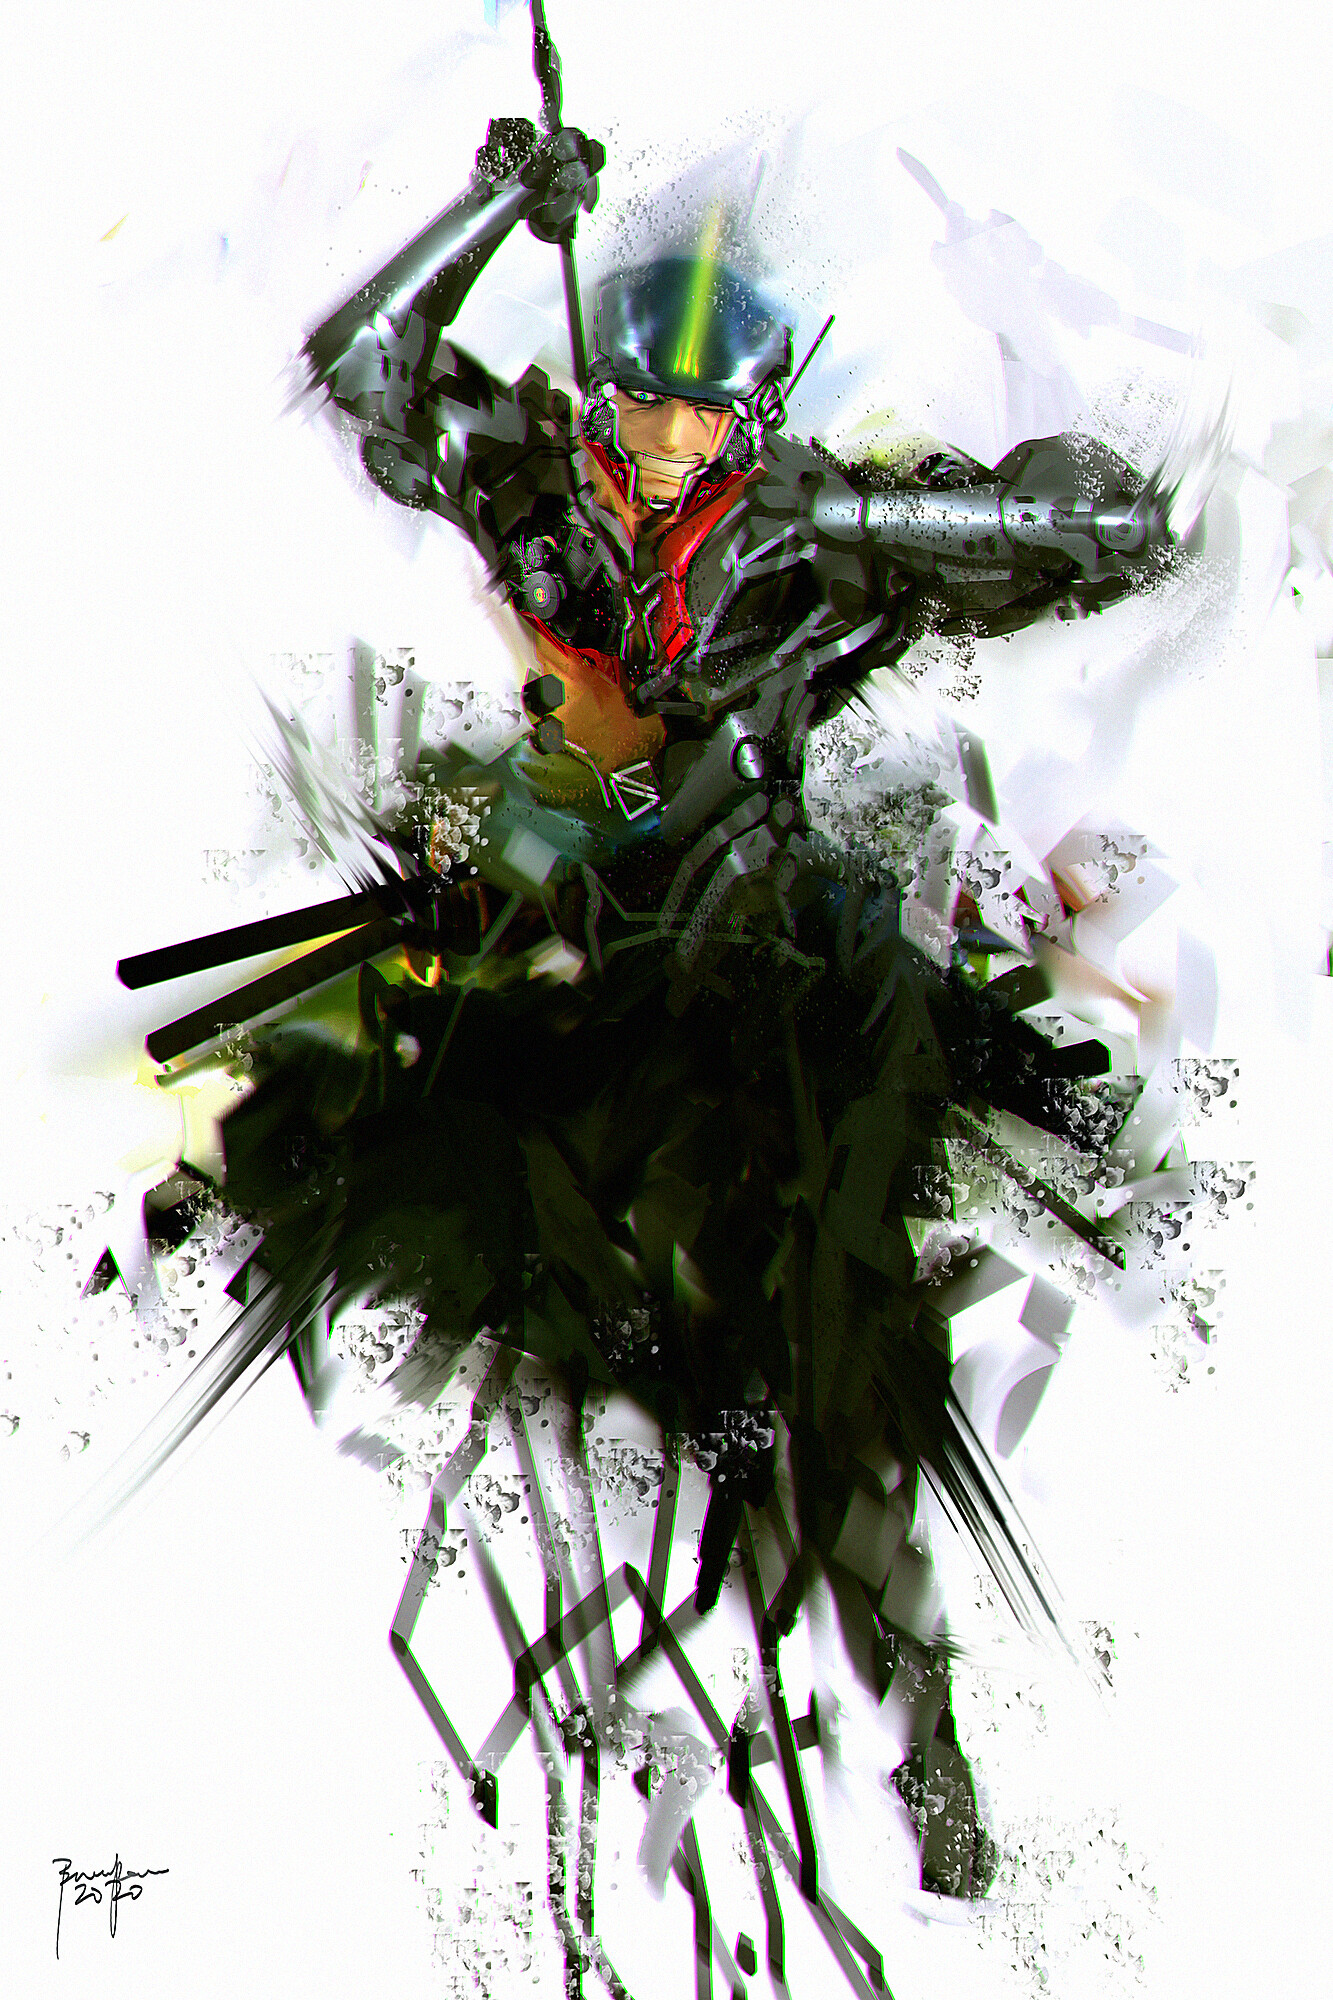 fanart - One Piece Roronoa Zoro